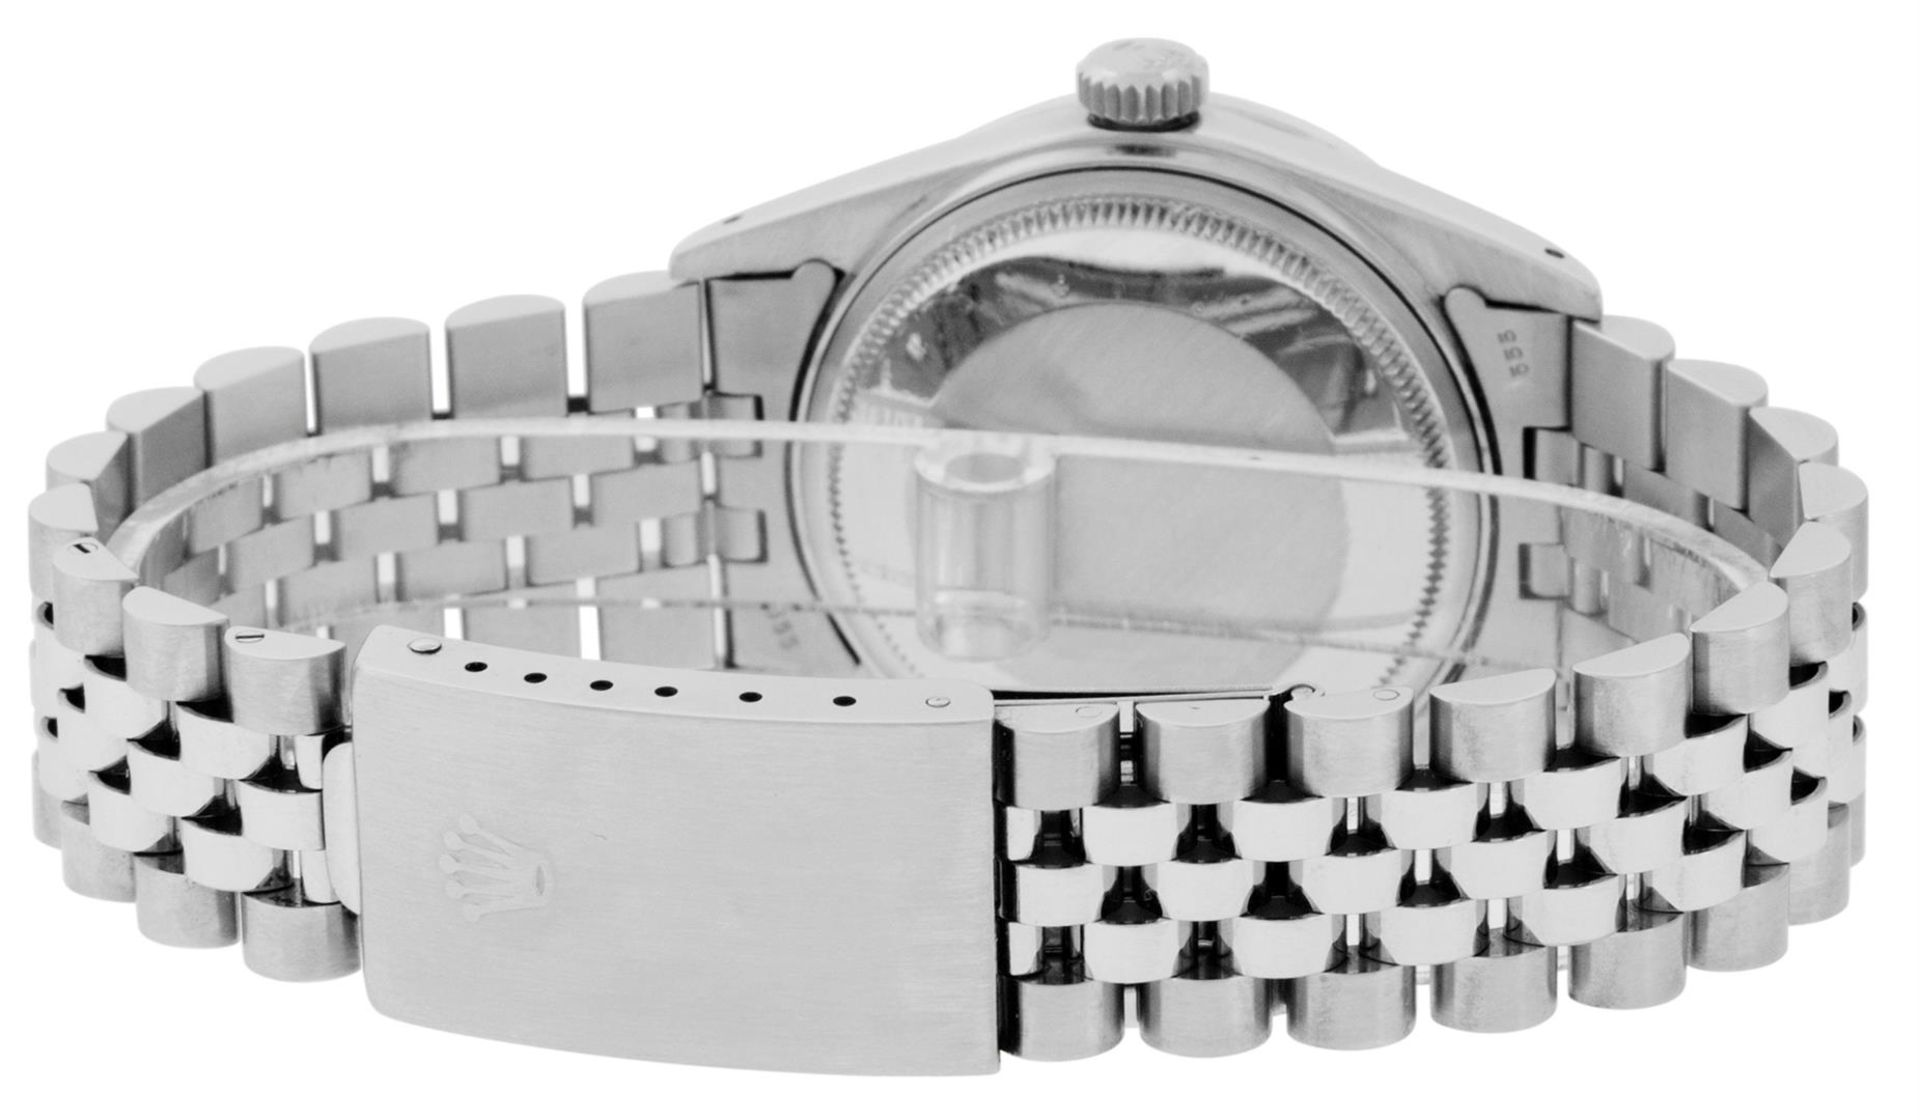 Rolex Mens Stainless Steel Black Diamond Lugs & Sapphire Datejust Wristwatch Oys - Image 6 of 9